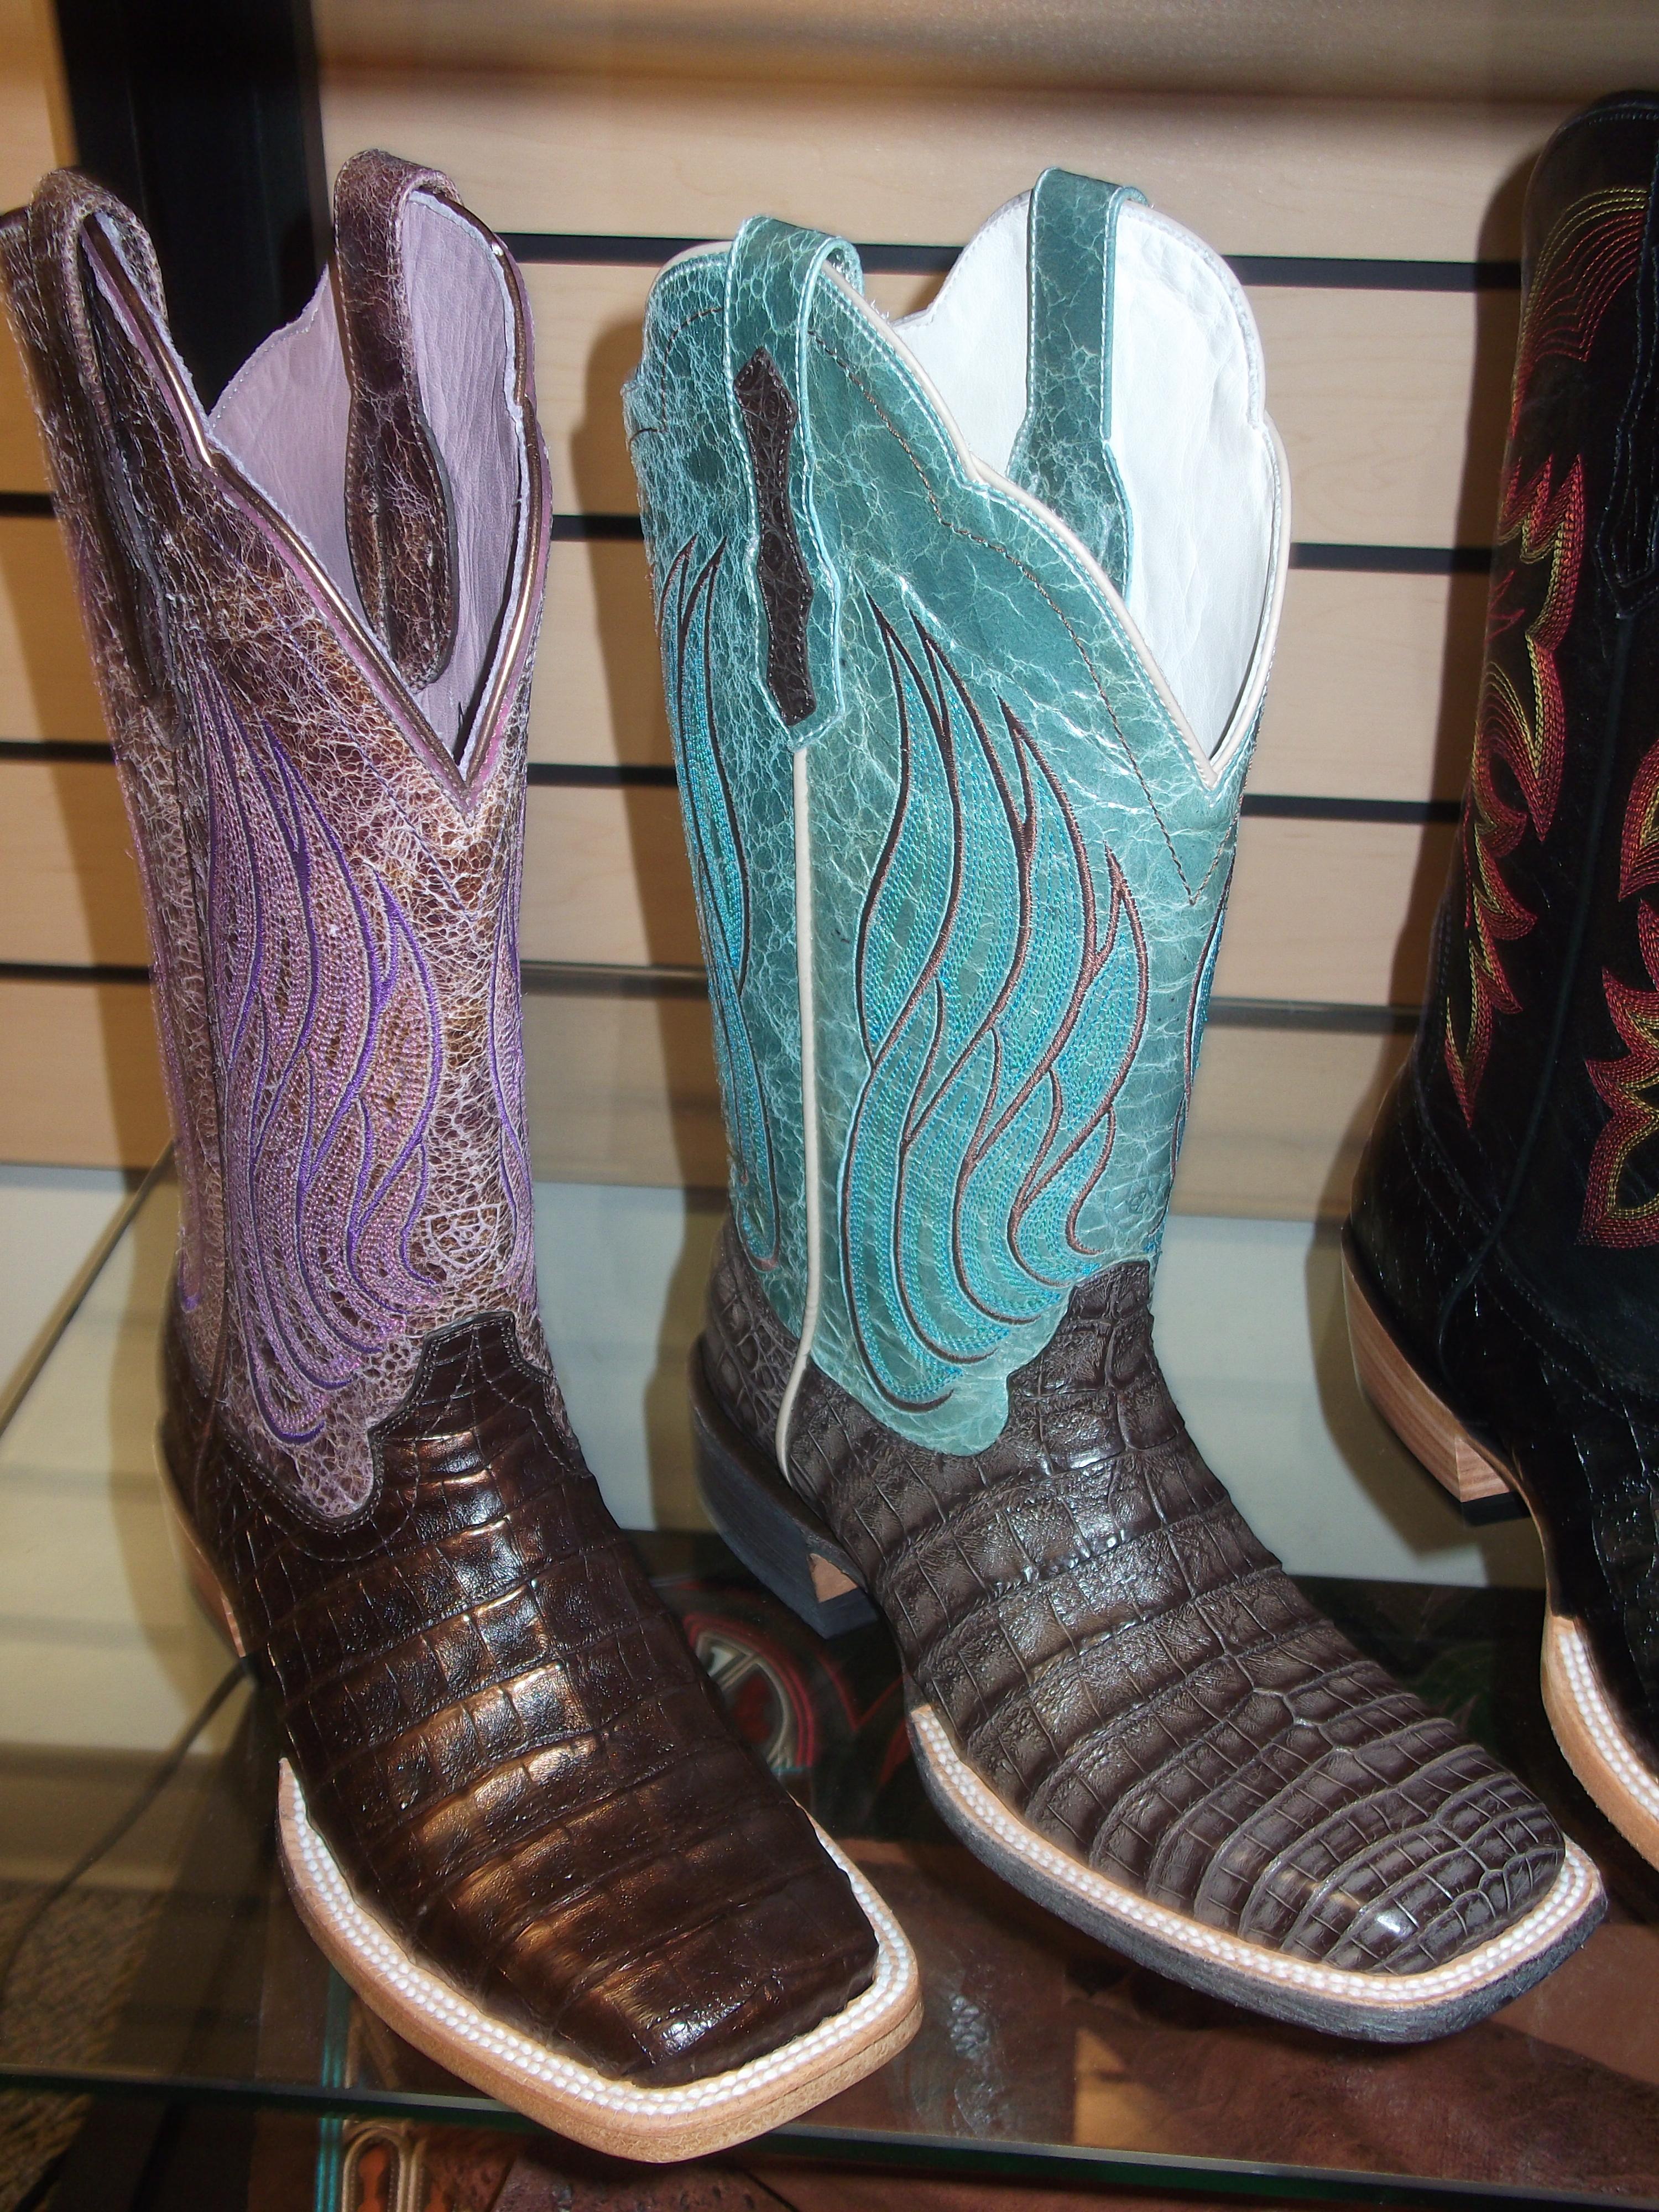 aa378fab764 Ariat's Nitro Caiman Belly Boots   Horses & Heels